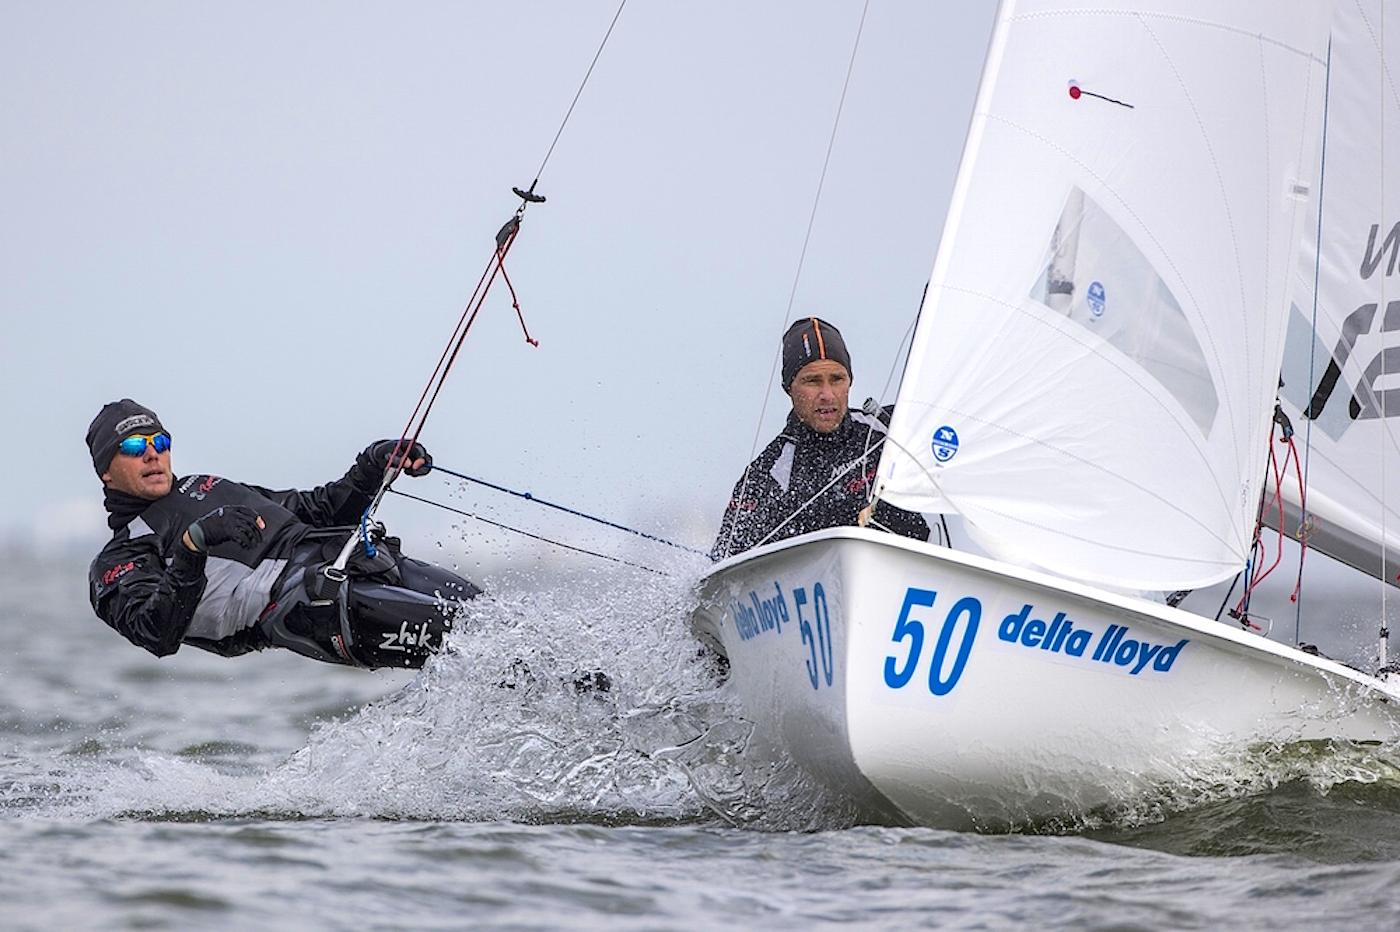 racing_bankappsegling_2015_Europacup_Molund_Ostling_470_Molund_Facebook